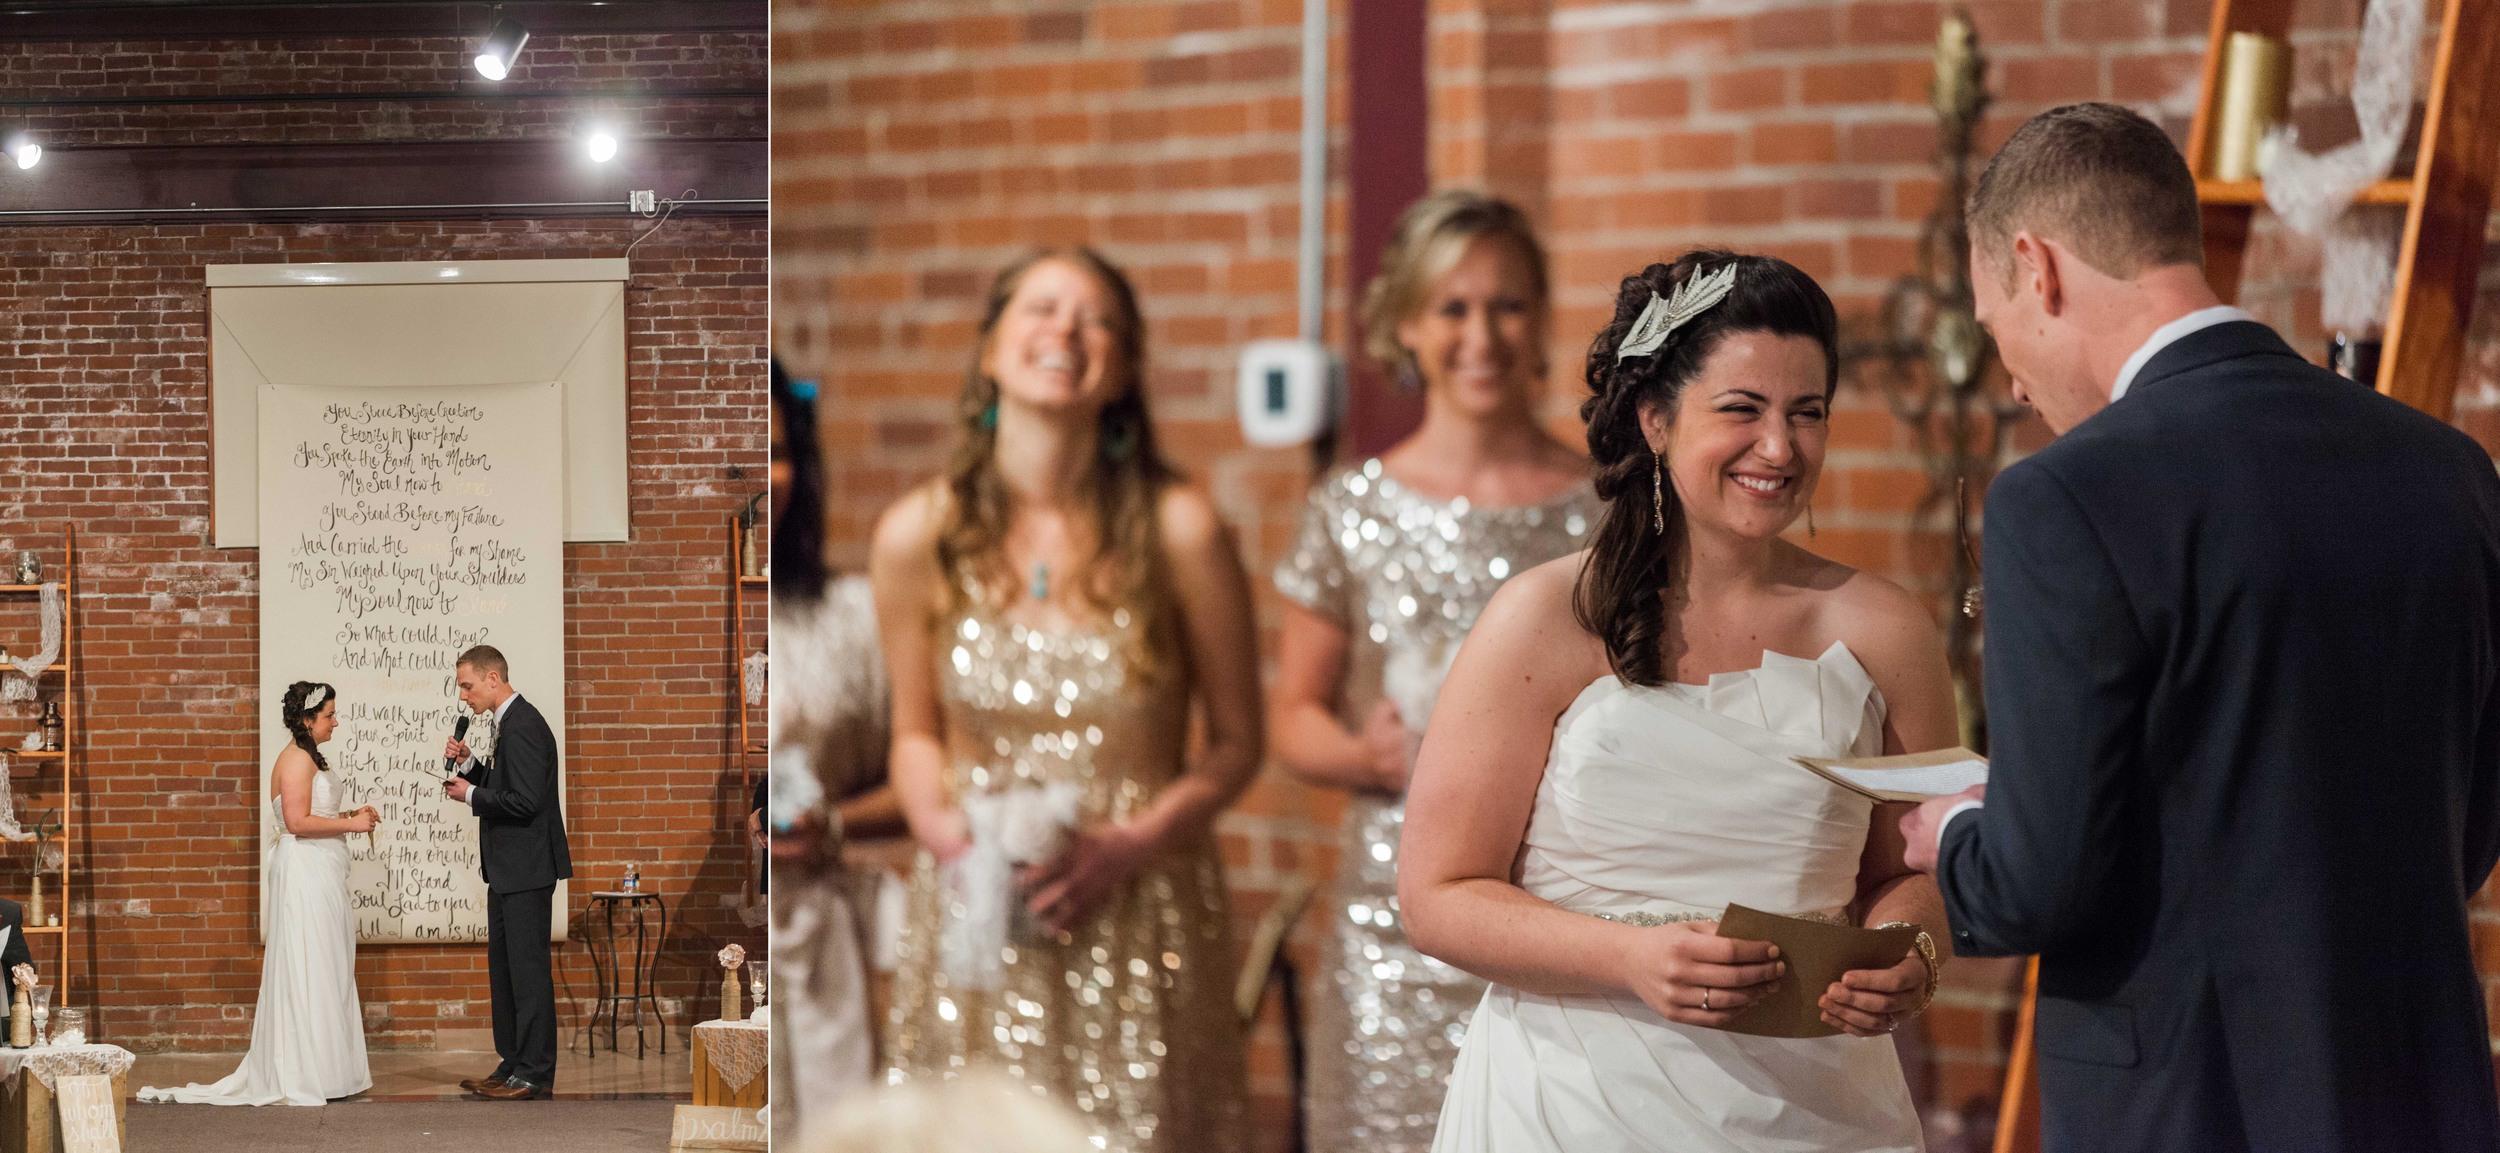 St Louis Wedding Photography-1037 copy.jpg